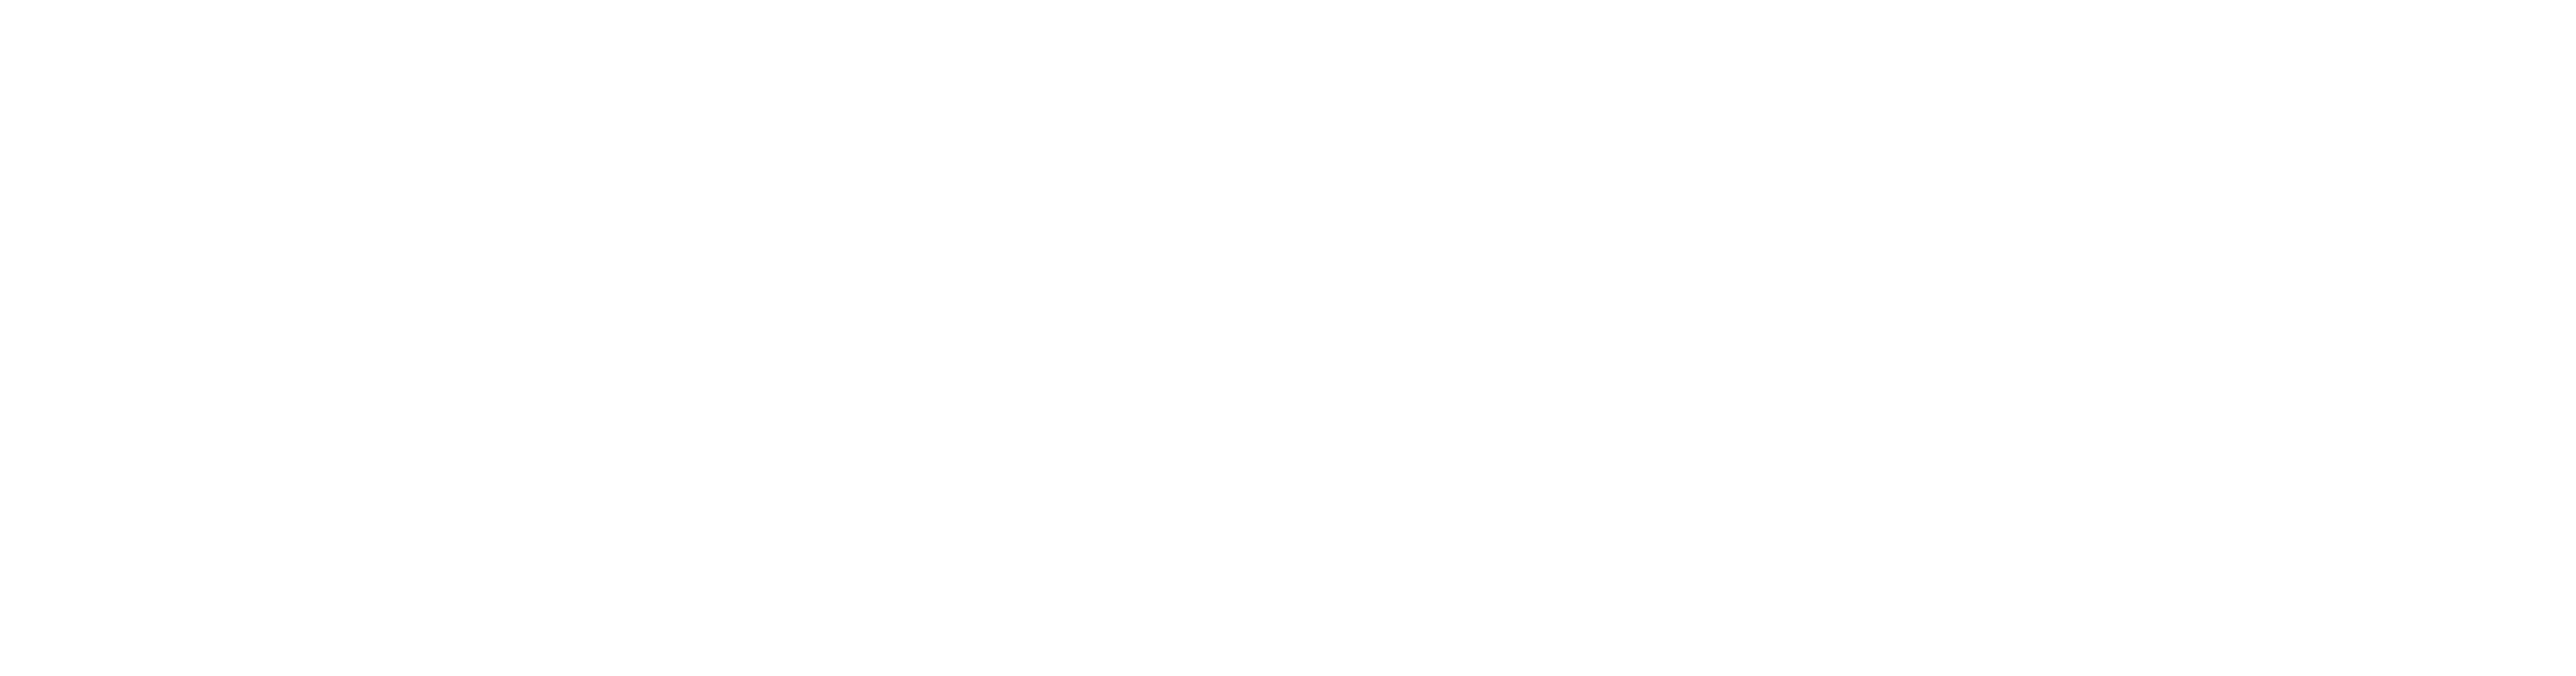 adaptive sports equipment